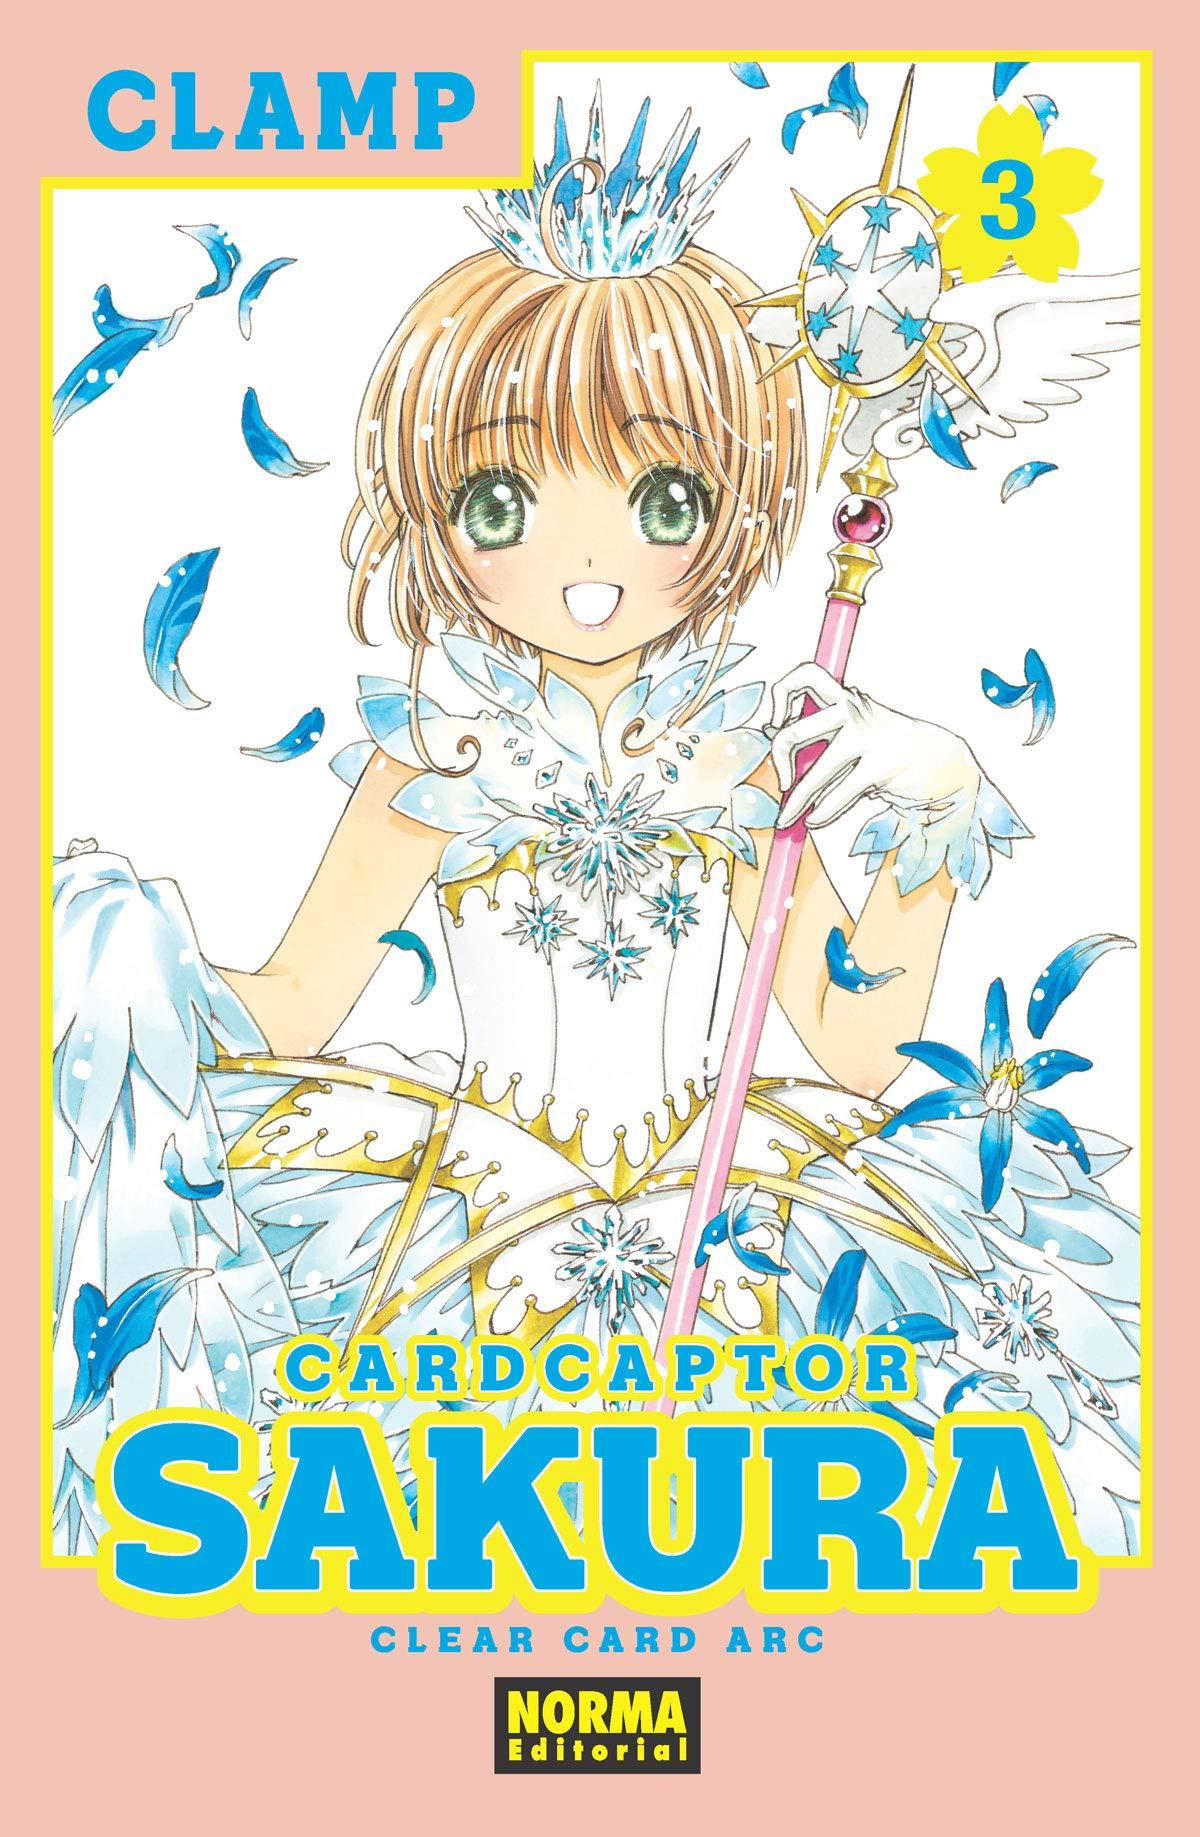 Card Captor Sakura Clear Card Arc 3 Tapa blanda – 31 oct 2018 CLAMP NORM8|#Norma Editorial 8467932791 FX